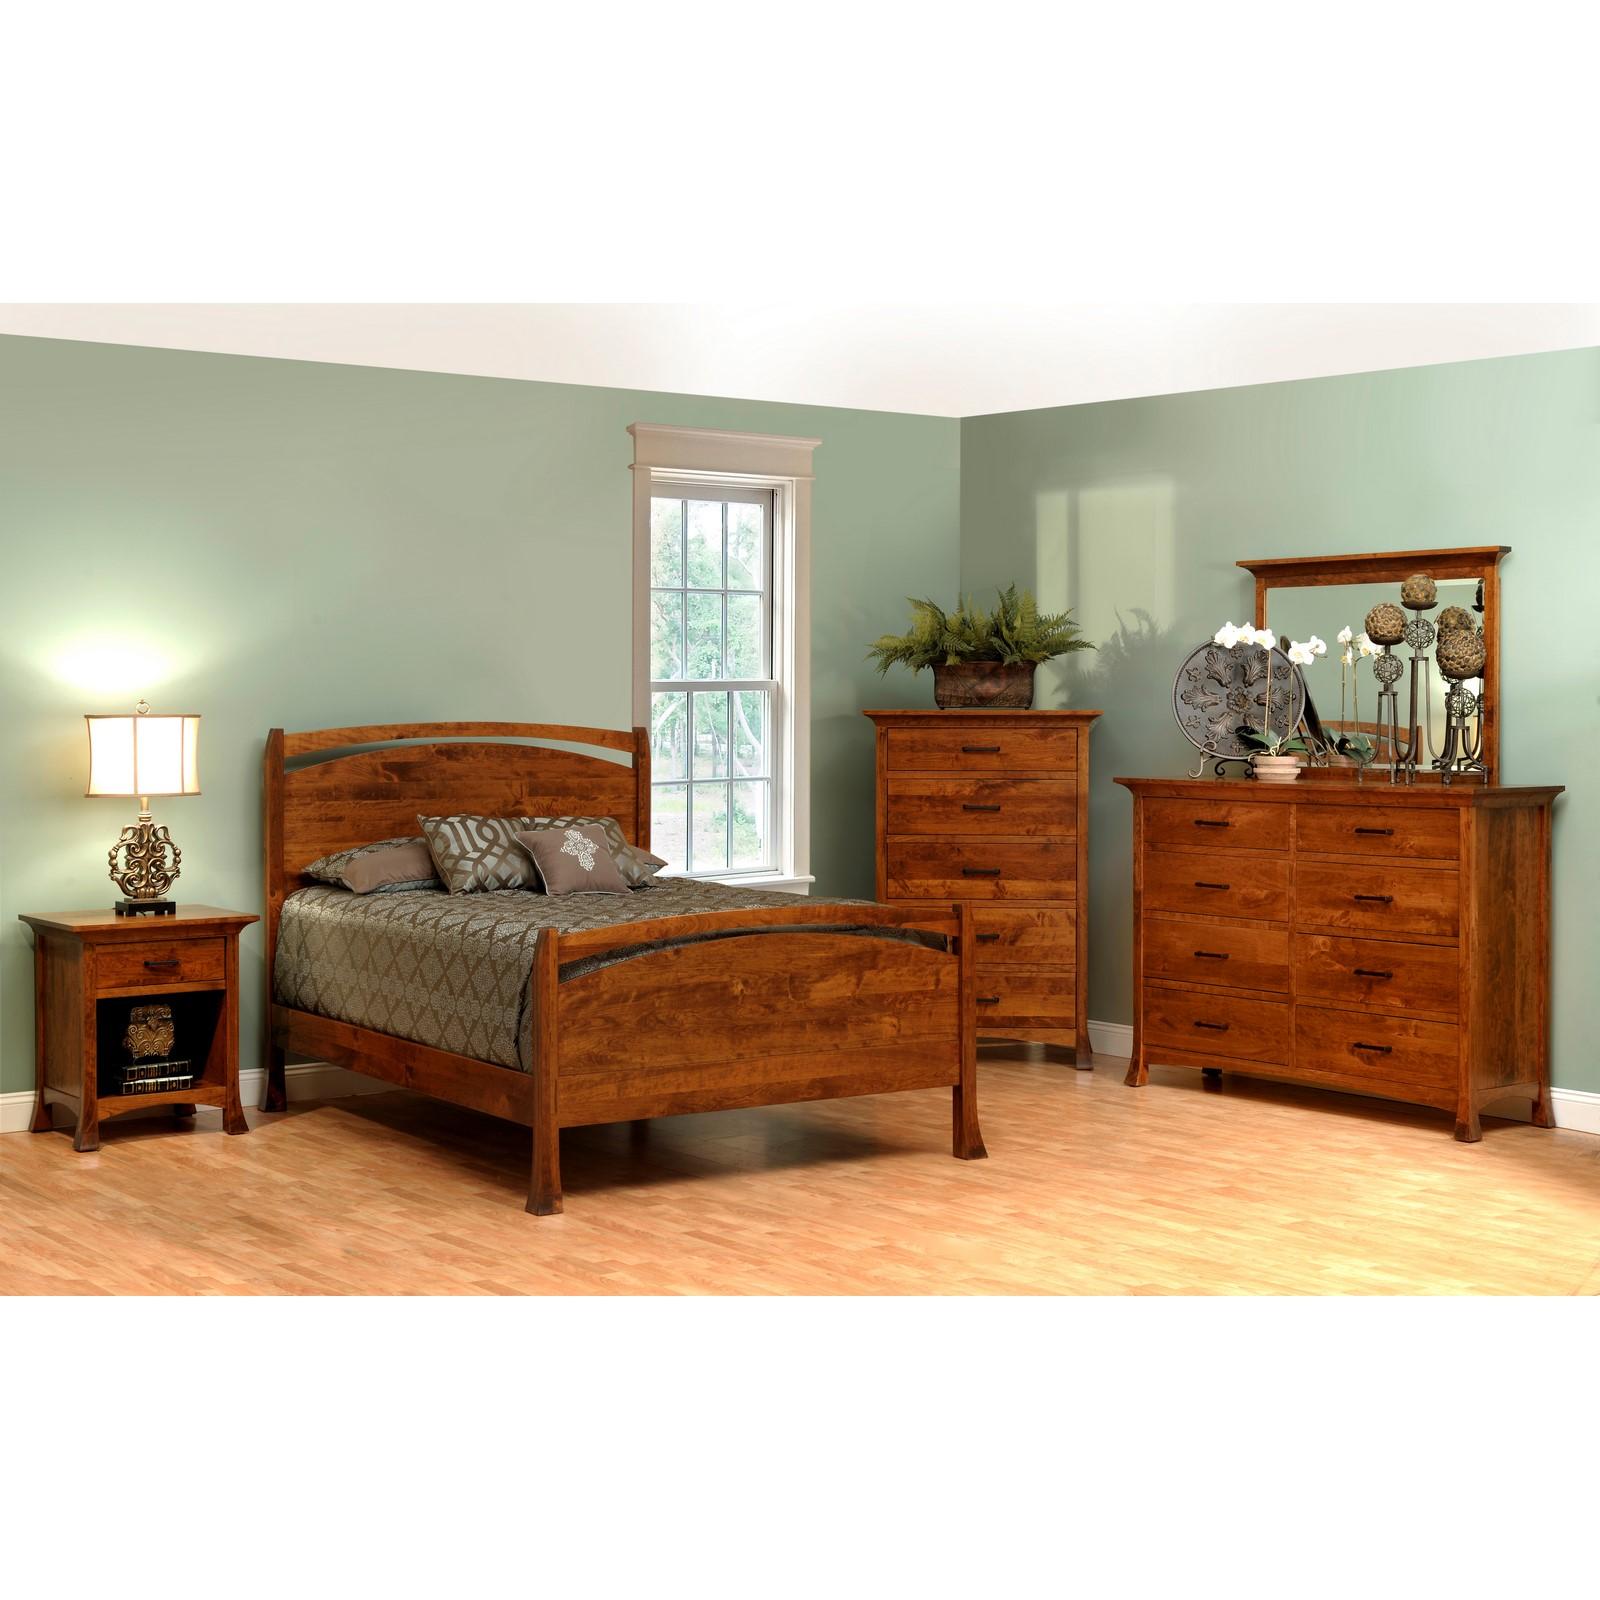 Millcraft Oasis Bedroom Set Stewart Roth Furniture